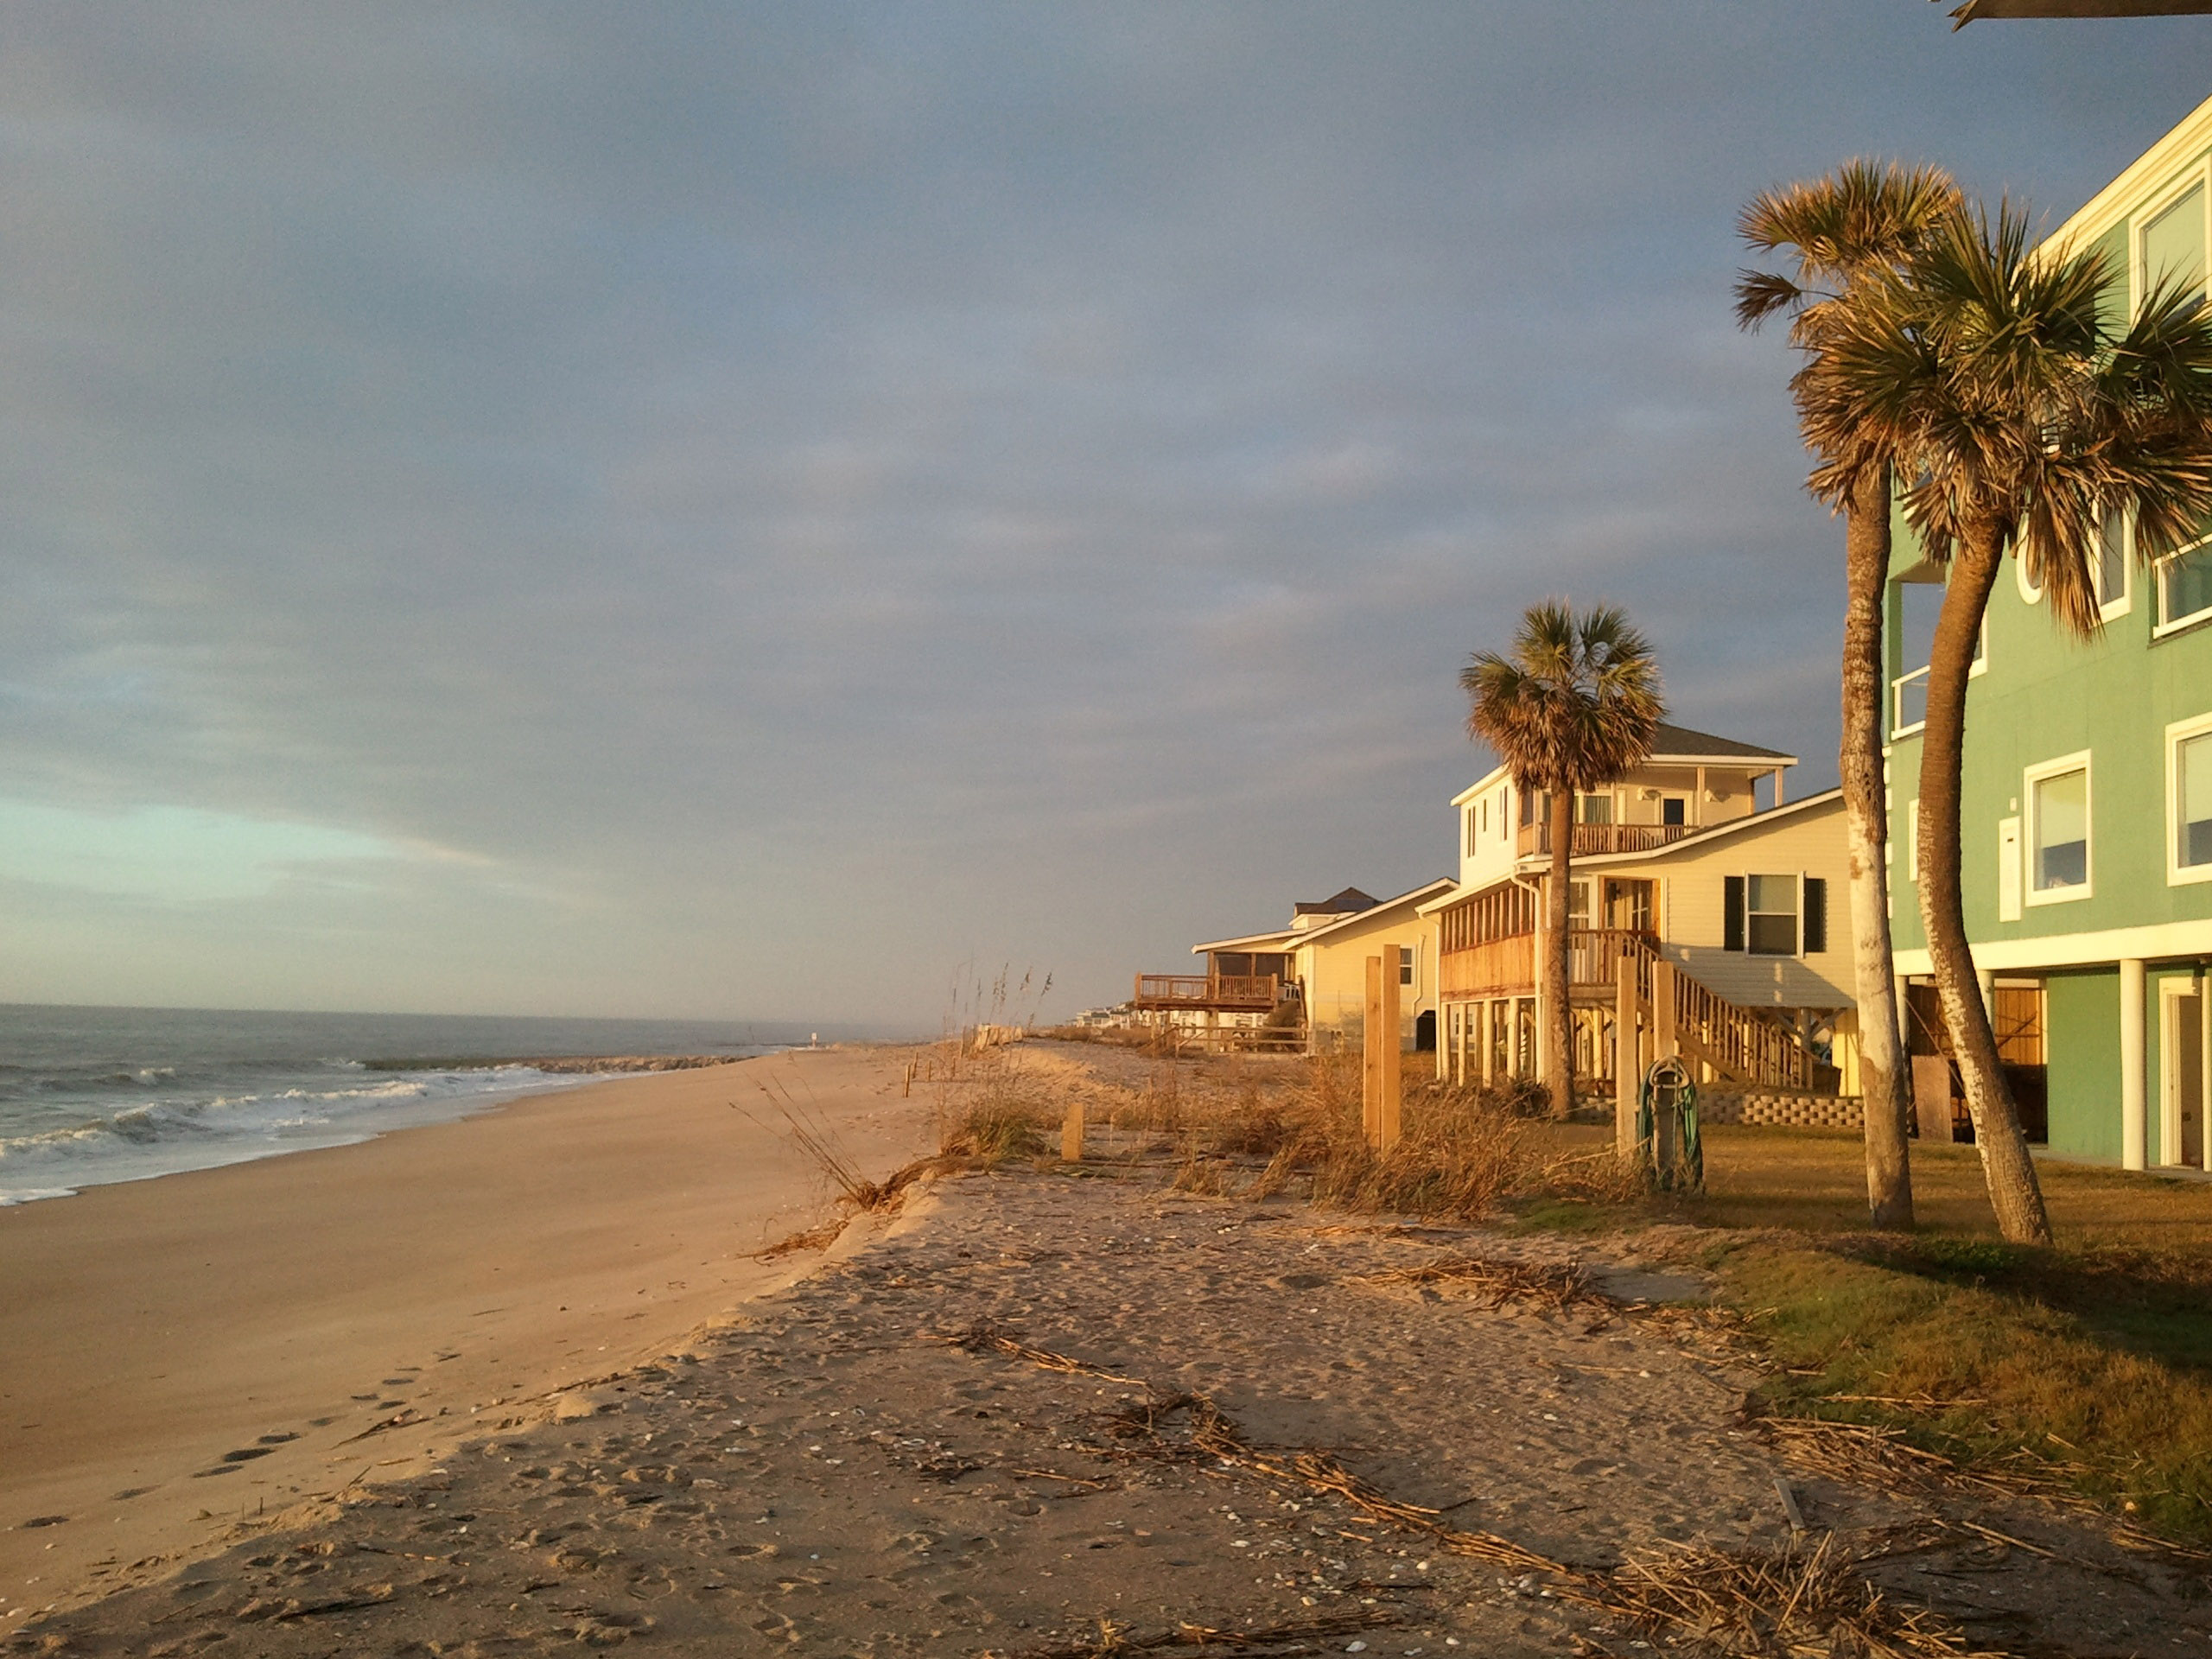 Shoreline Landscape Of Estido Island In South Carolina Image Free Stock Photo Public Domain Photo Cc0 Images